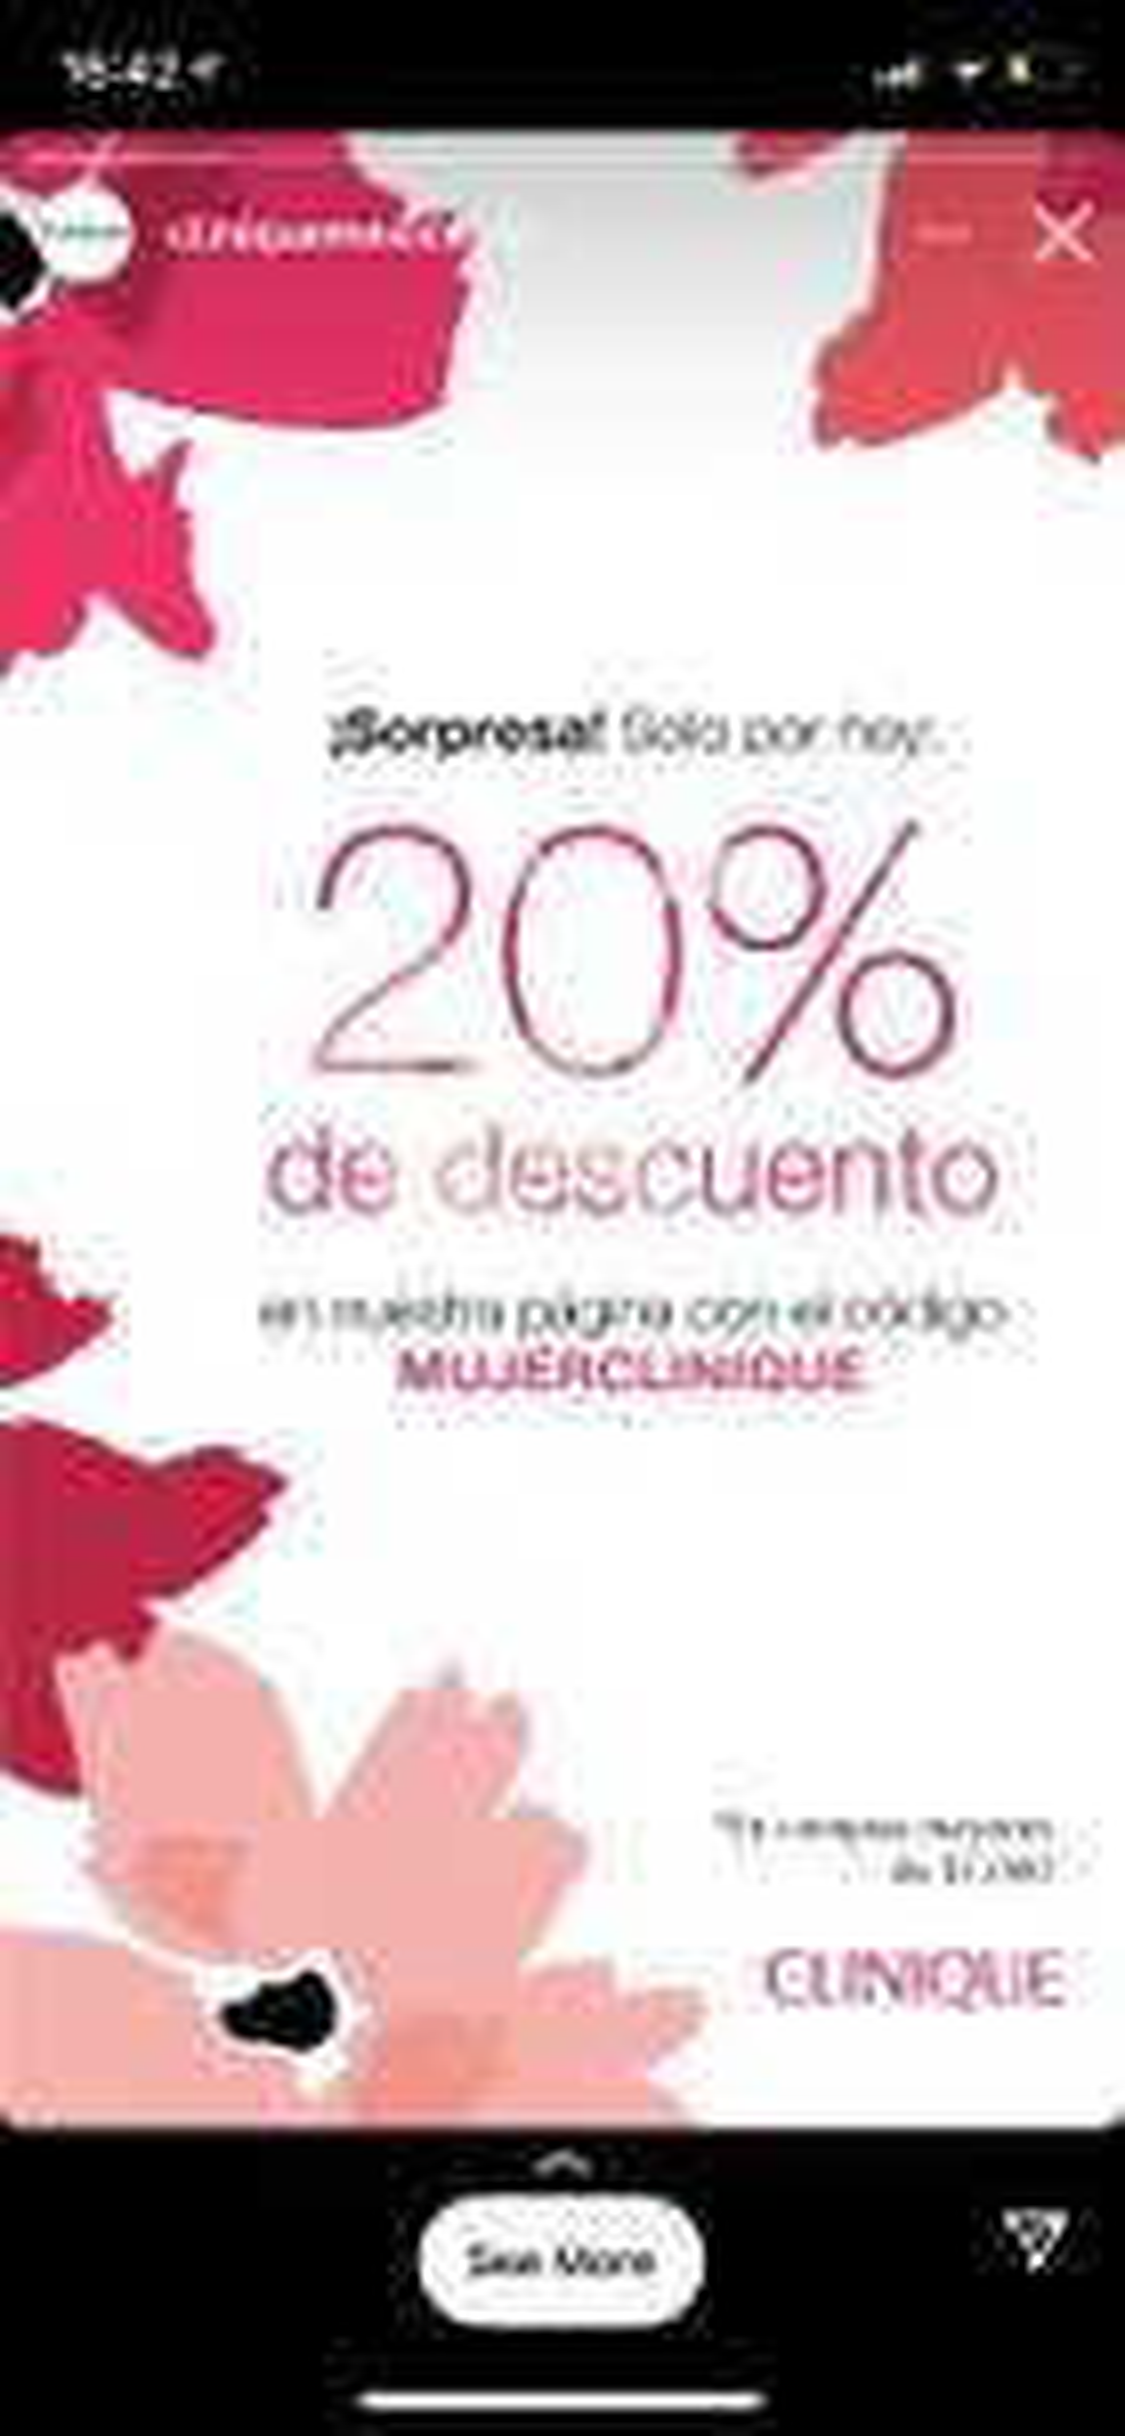 Clinique: Solo hoy! 20% descuento + cosmetiquera y 6 minis